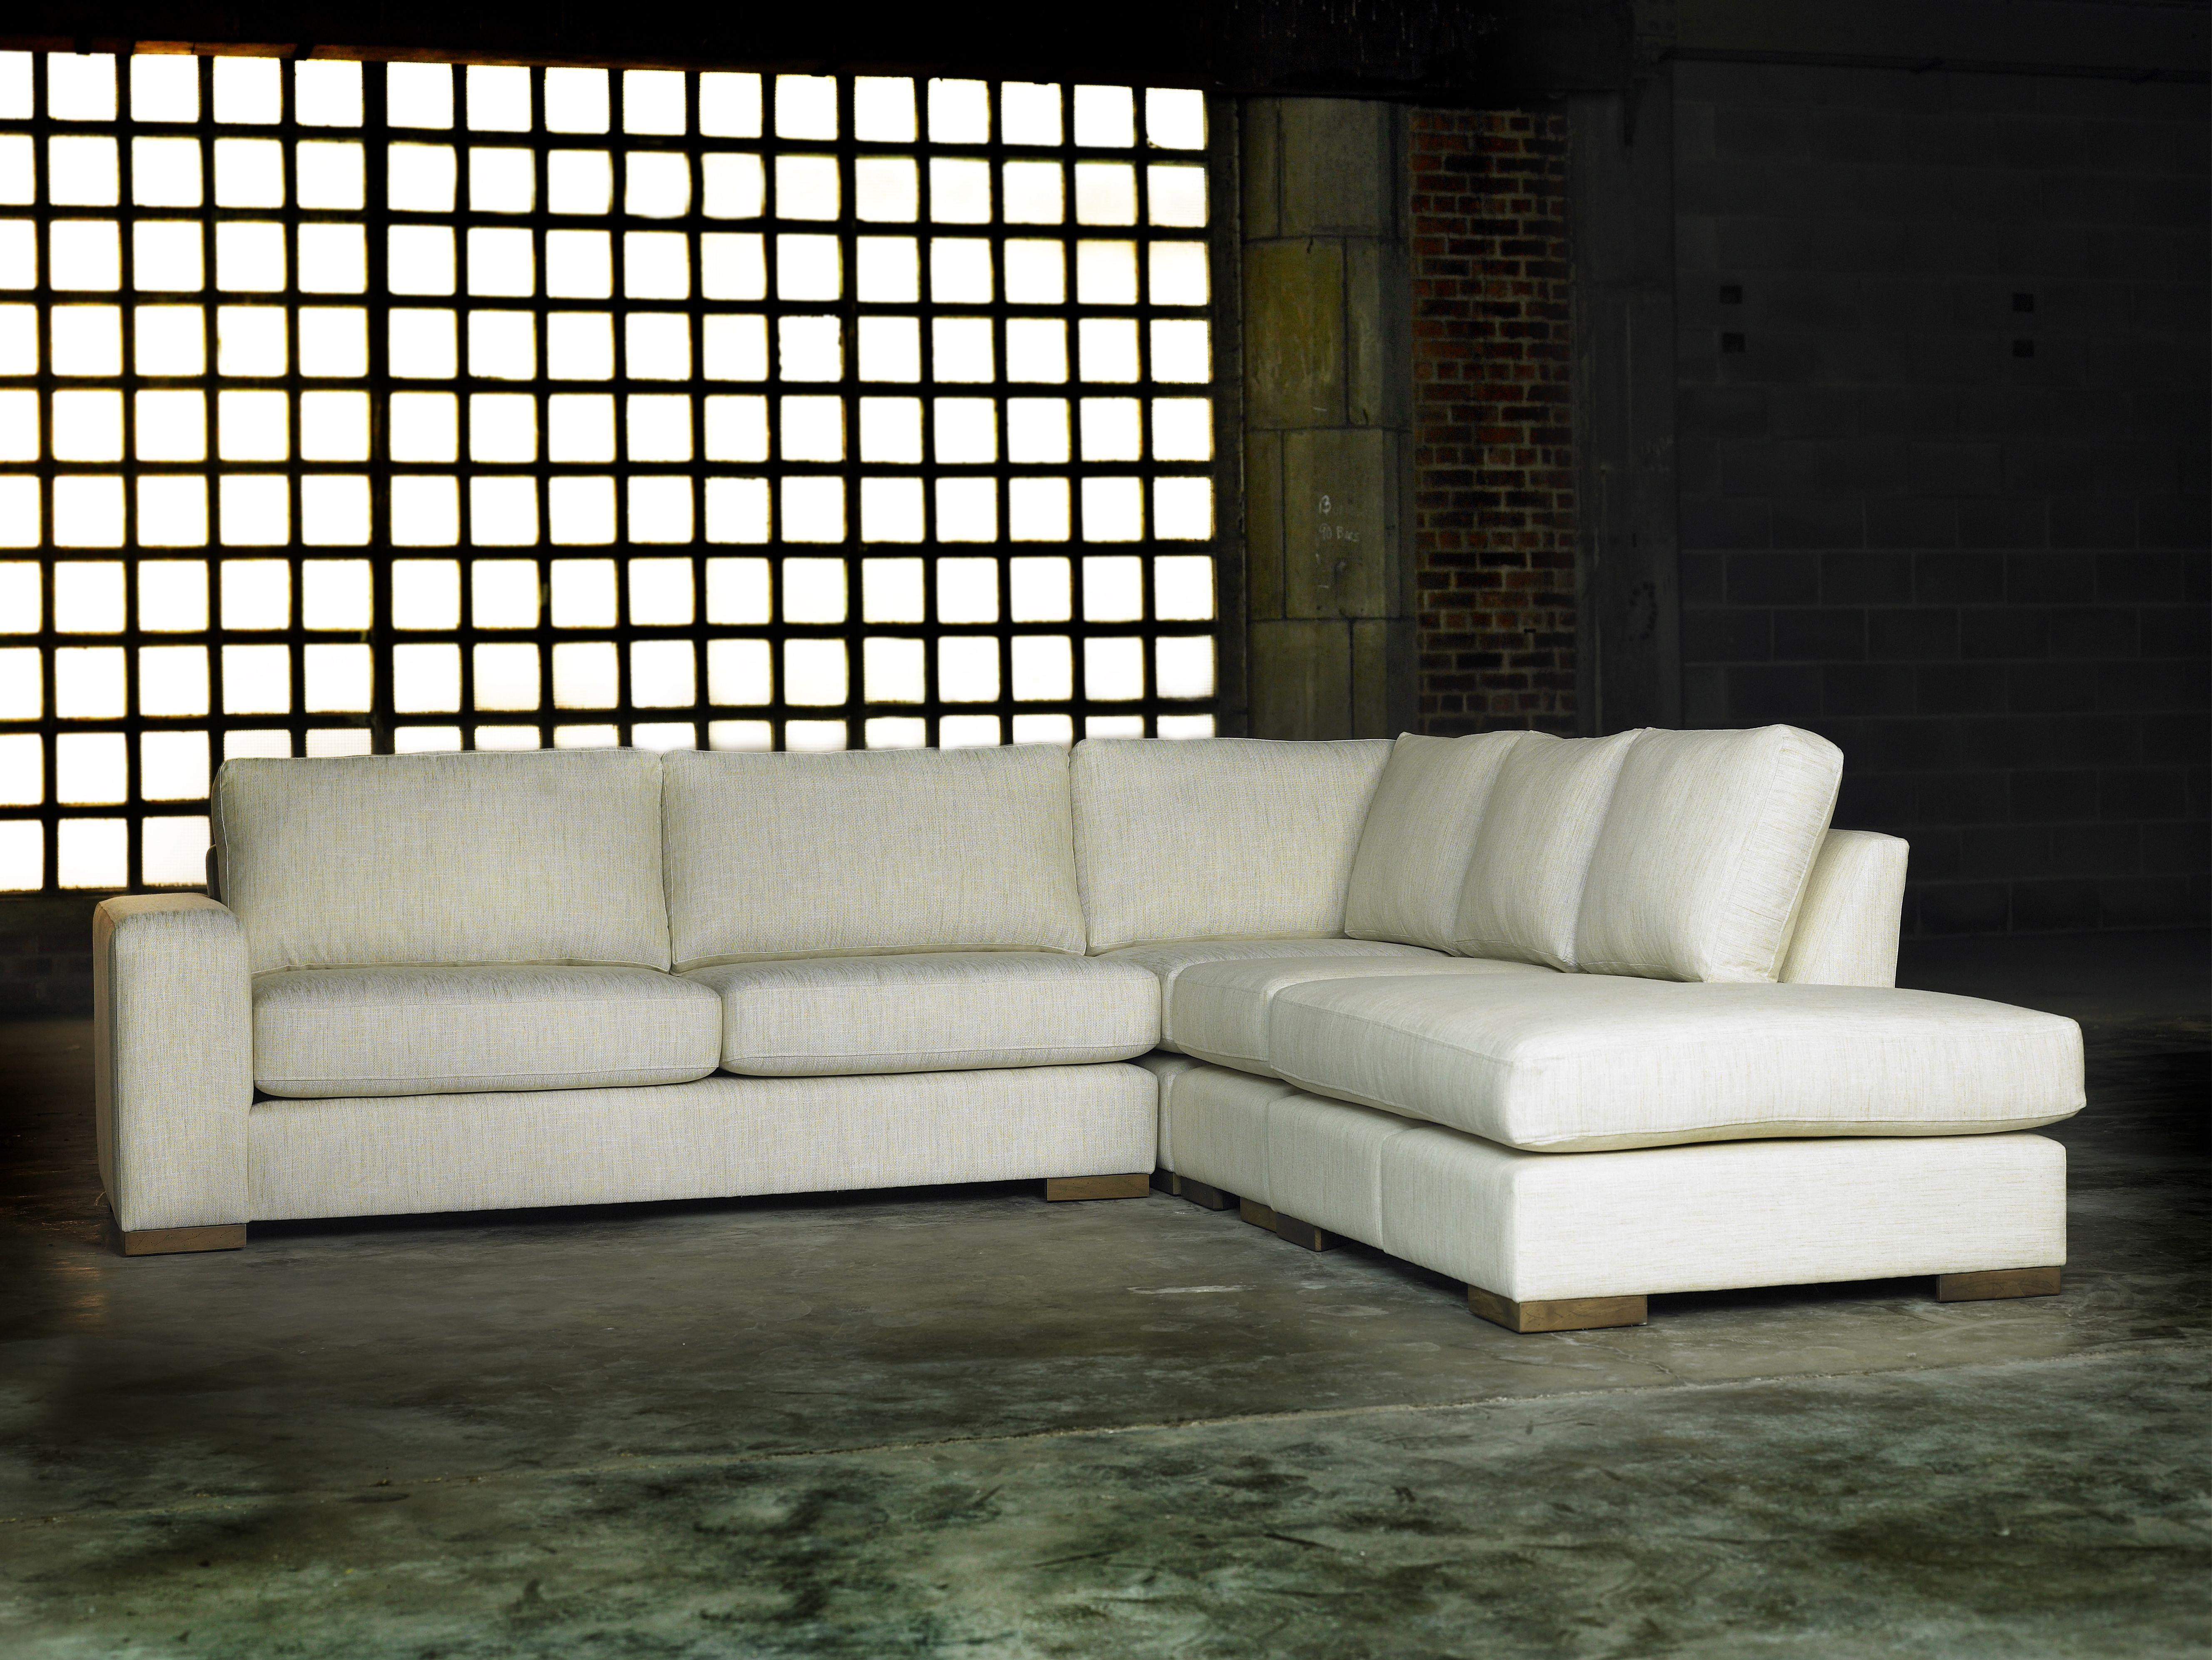 The Prezzo Corner Sofa Low and laid back An Italian inspired